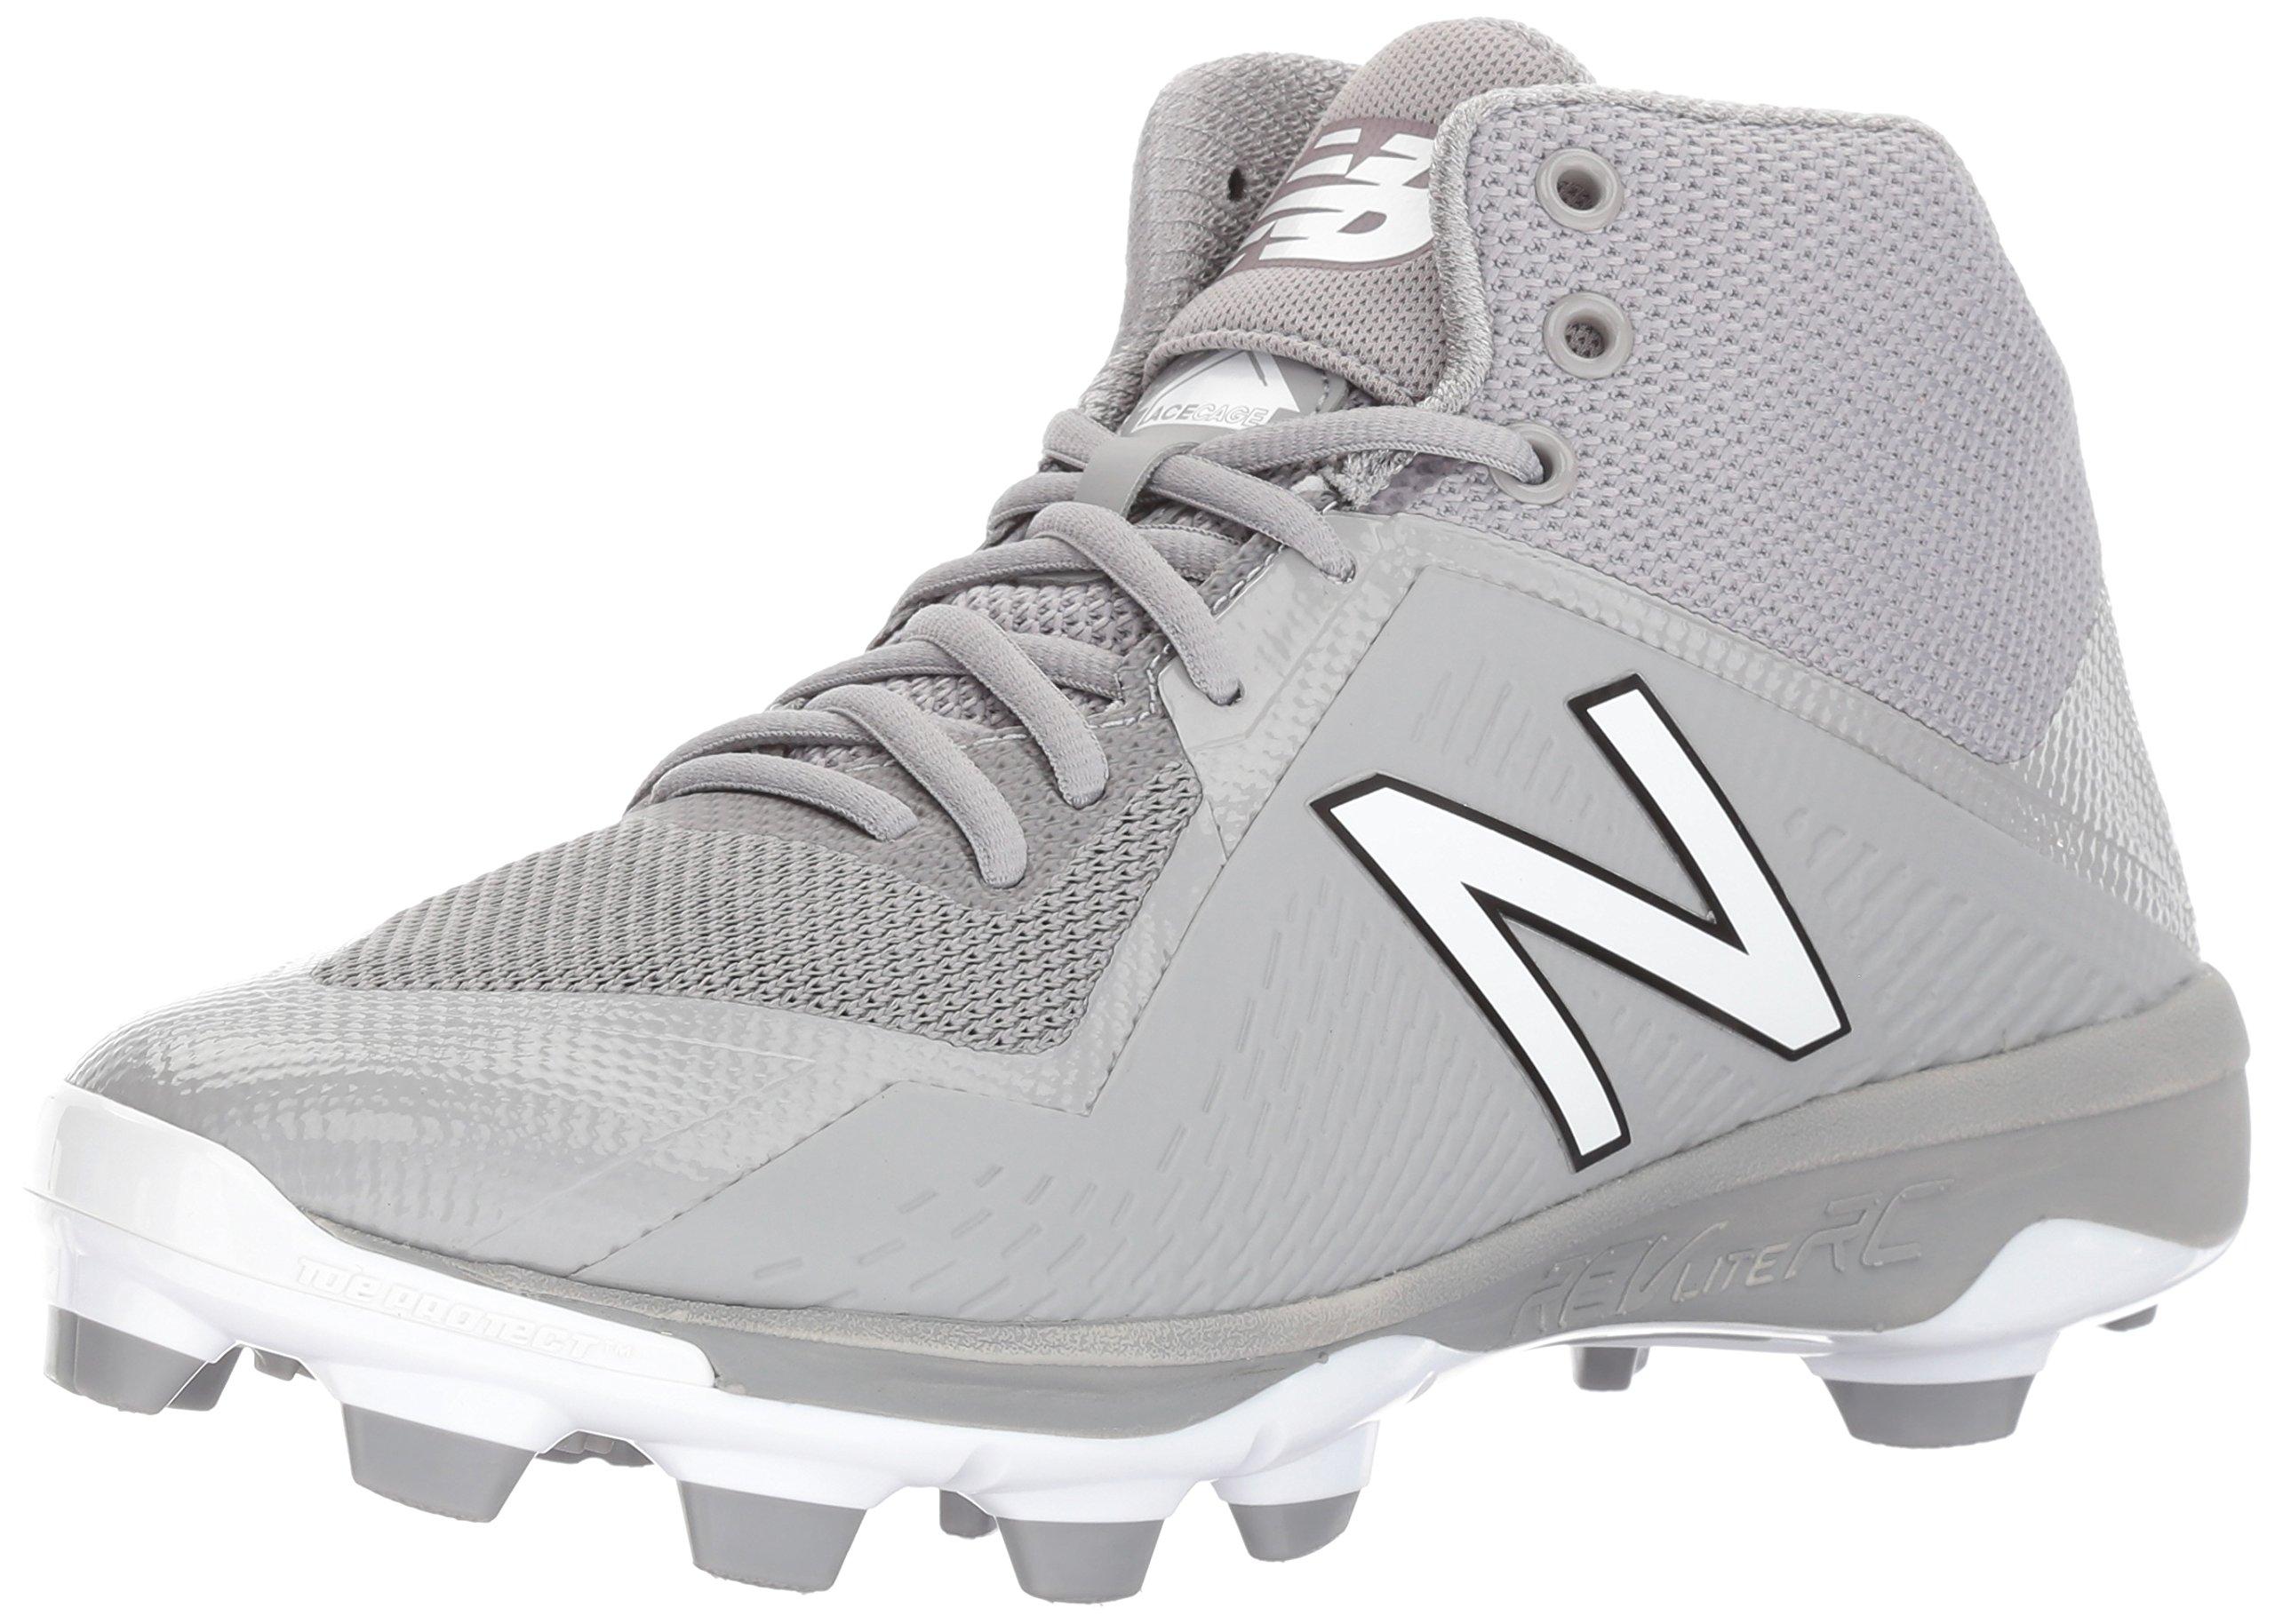 New Balance Men's PM4040v4 Molded Baseball Shoe, Grey, 15 D US